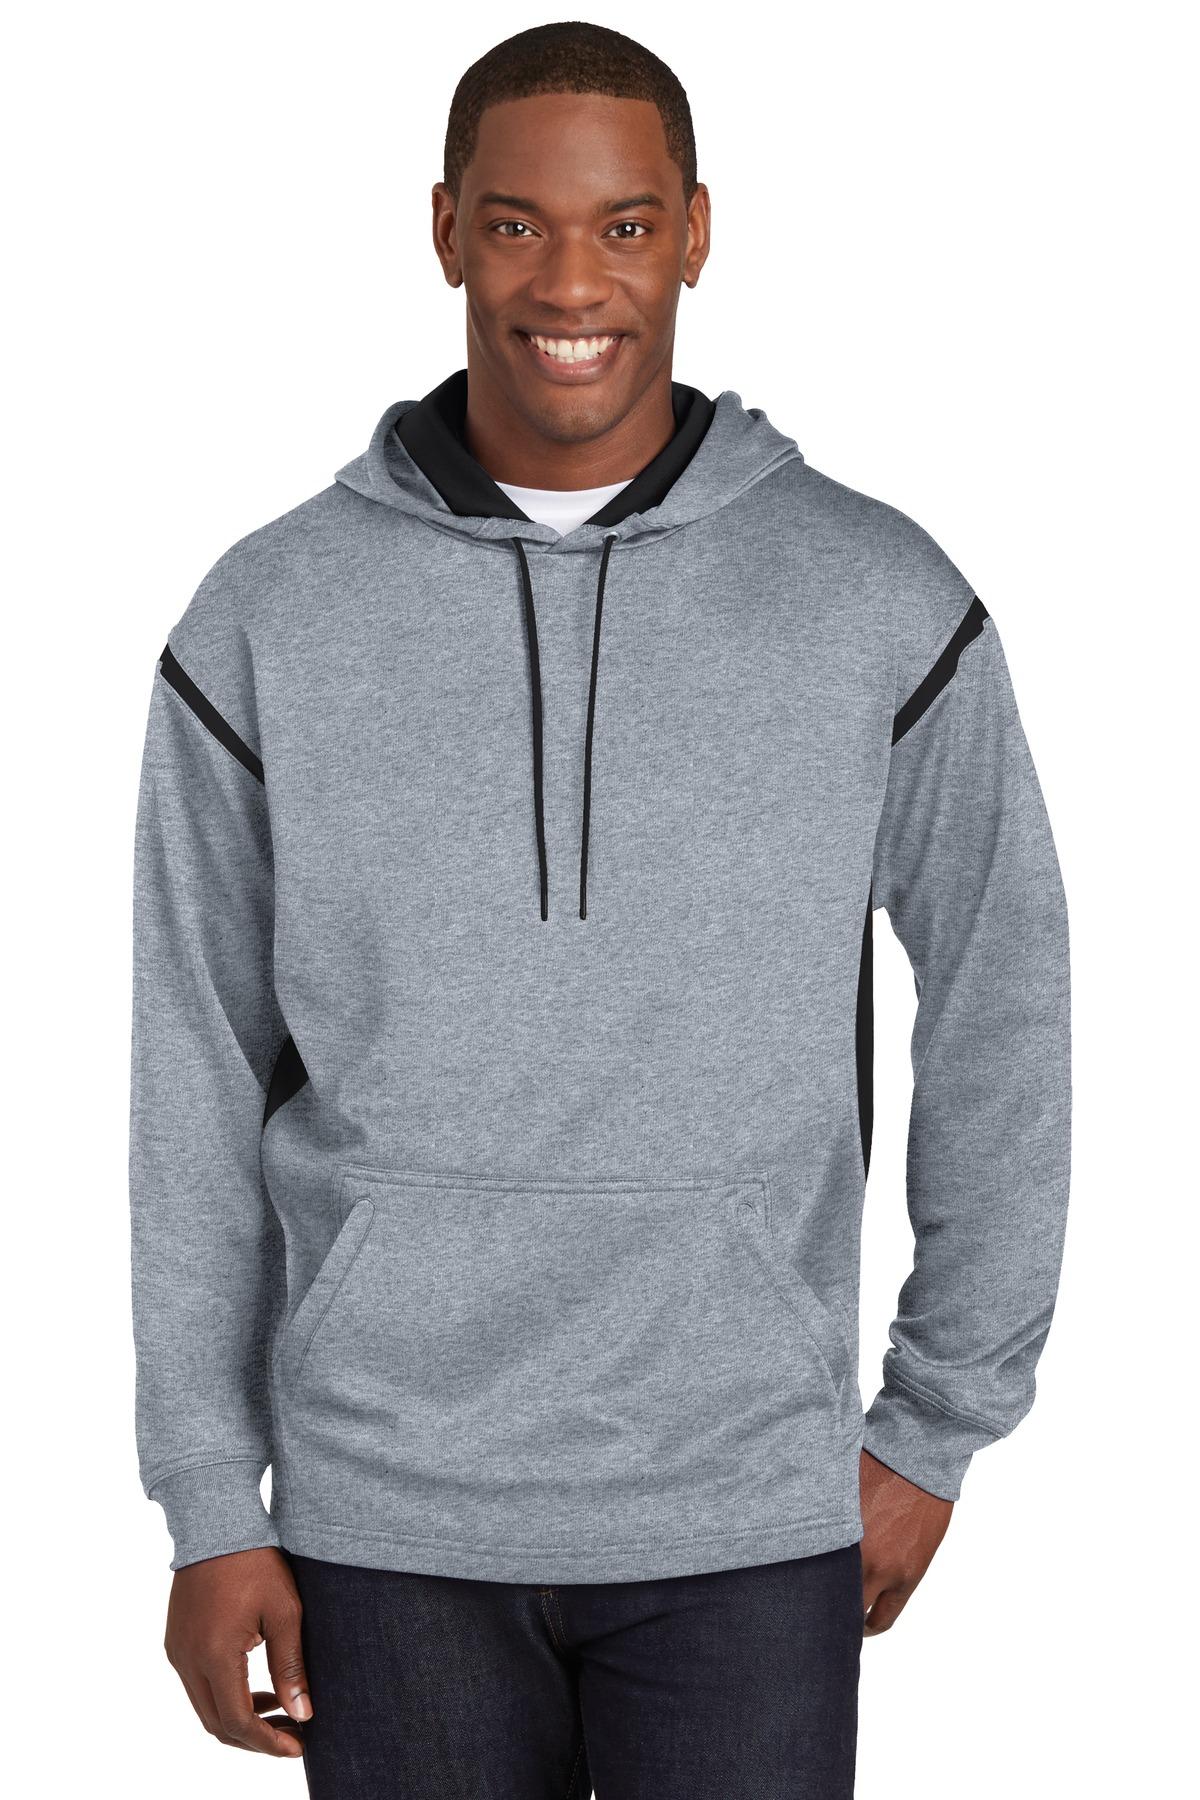 a7ecc130dc7 ... Sport-Tek ® Tech Fleece Colorblock Hooded Sweatshirt. F246. Previous   Next